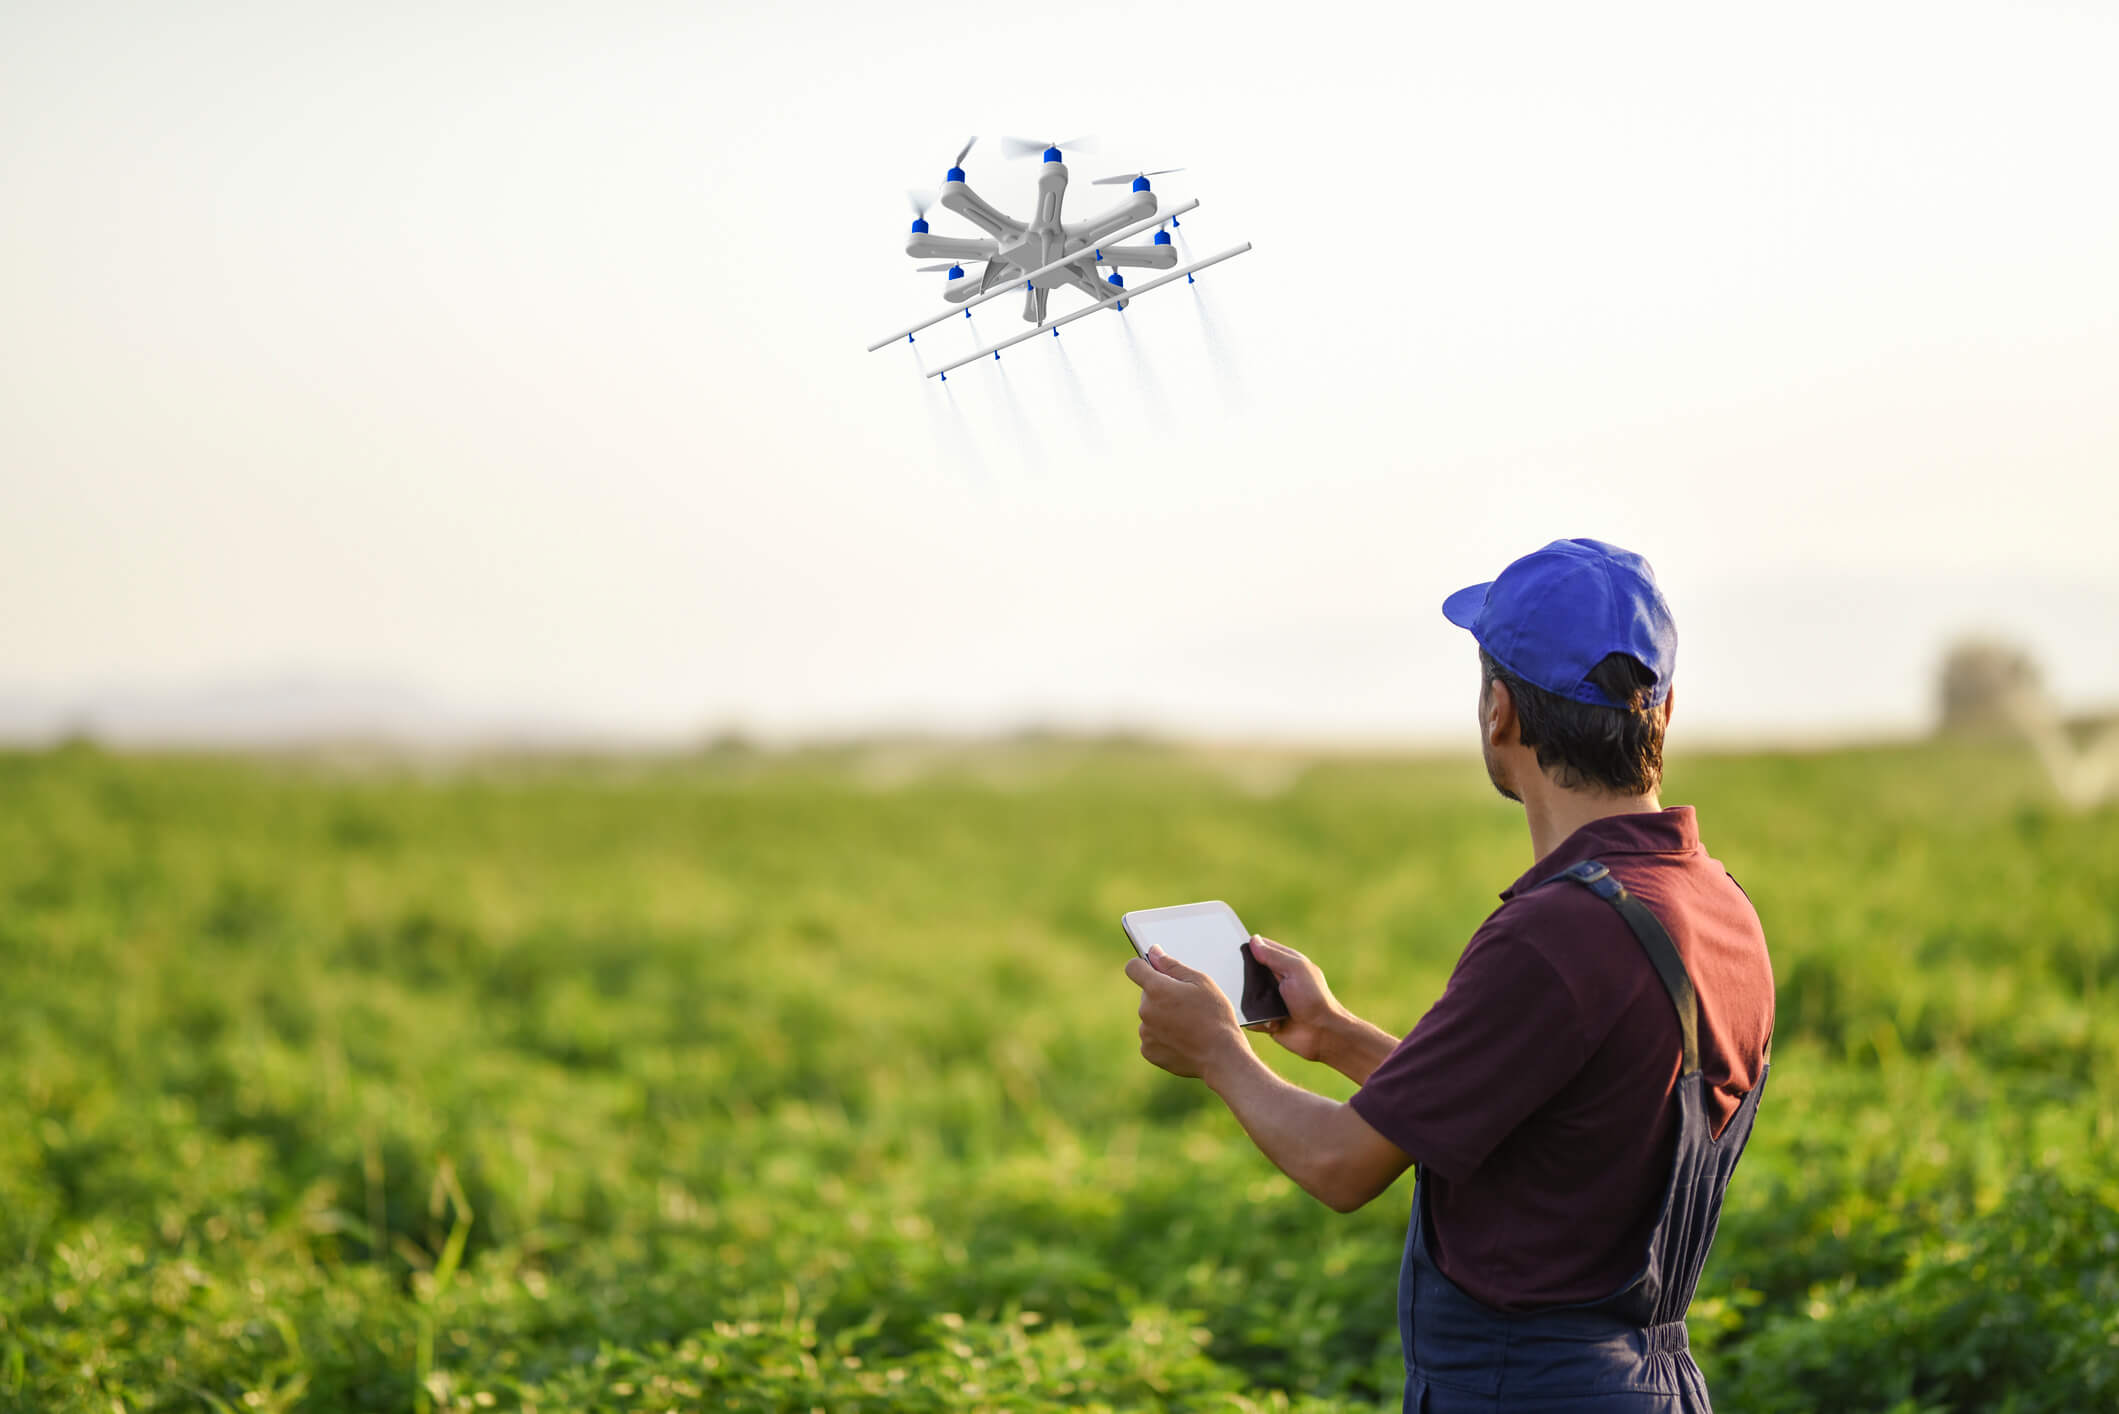 curso-piloto-de-drone-aprenda-a-pilotar-drone-helena-bocayuva-drone-para-agronegocio